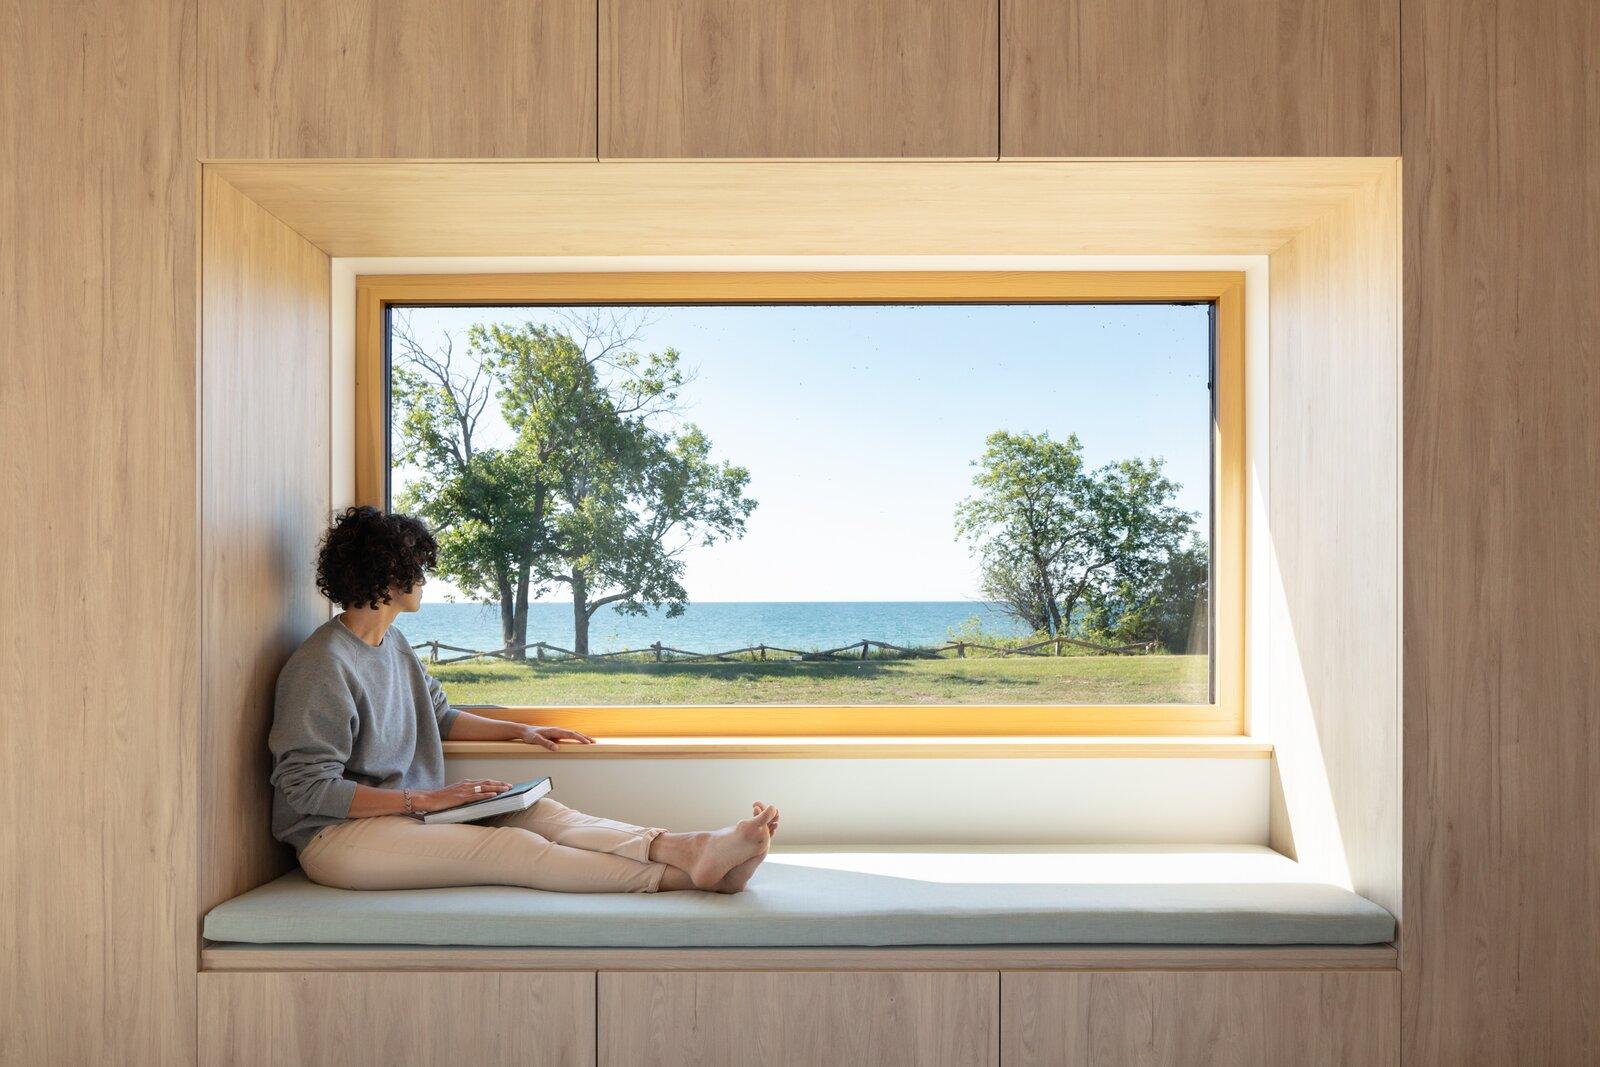 Ravi Handa Architect and AAmp Studio Ell House bedroom